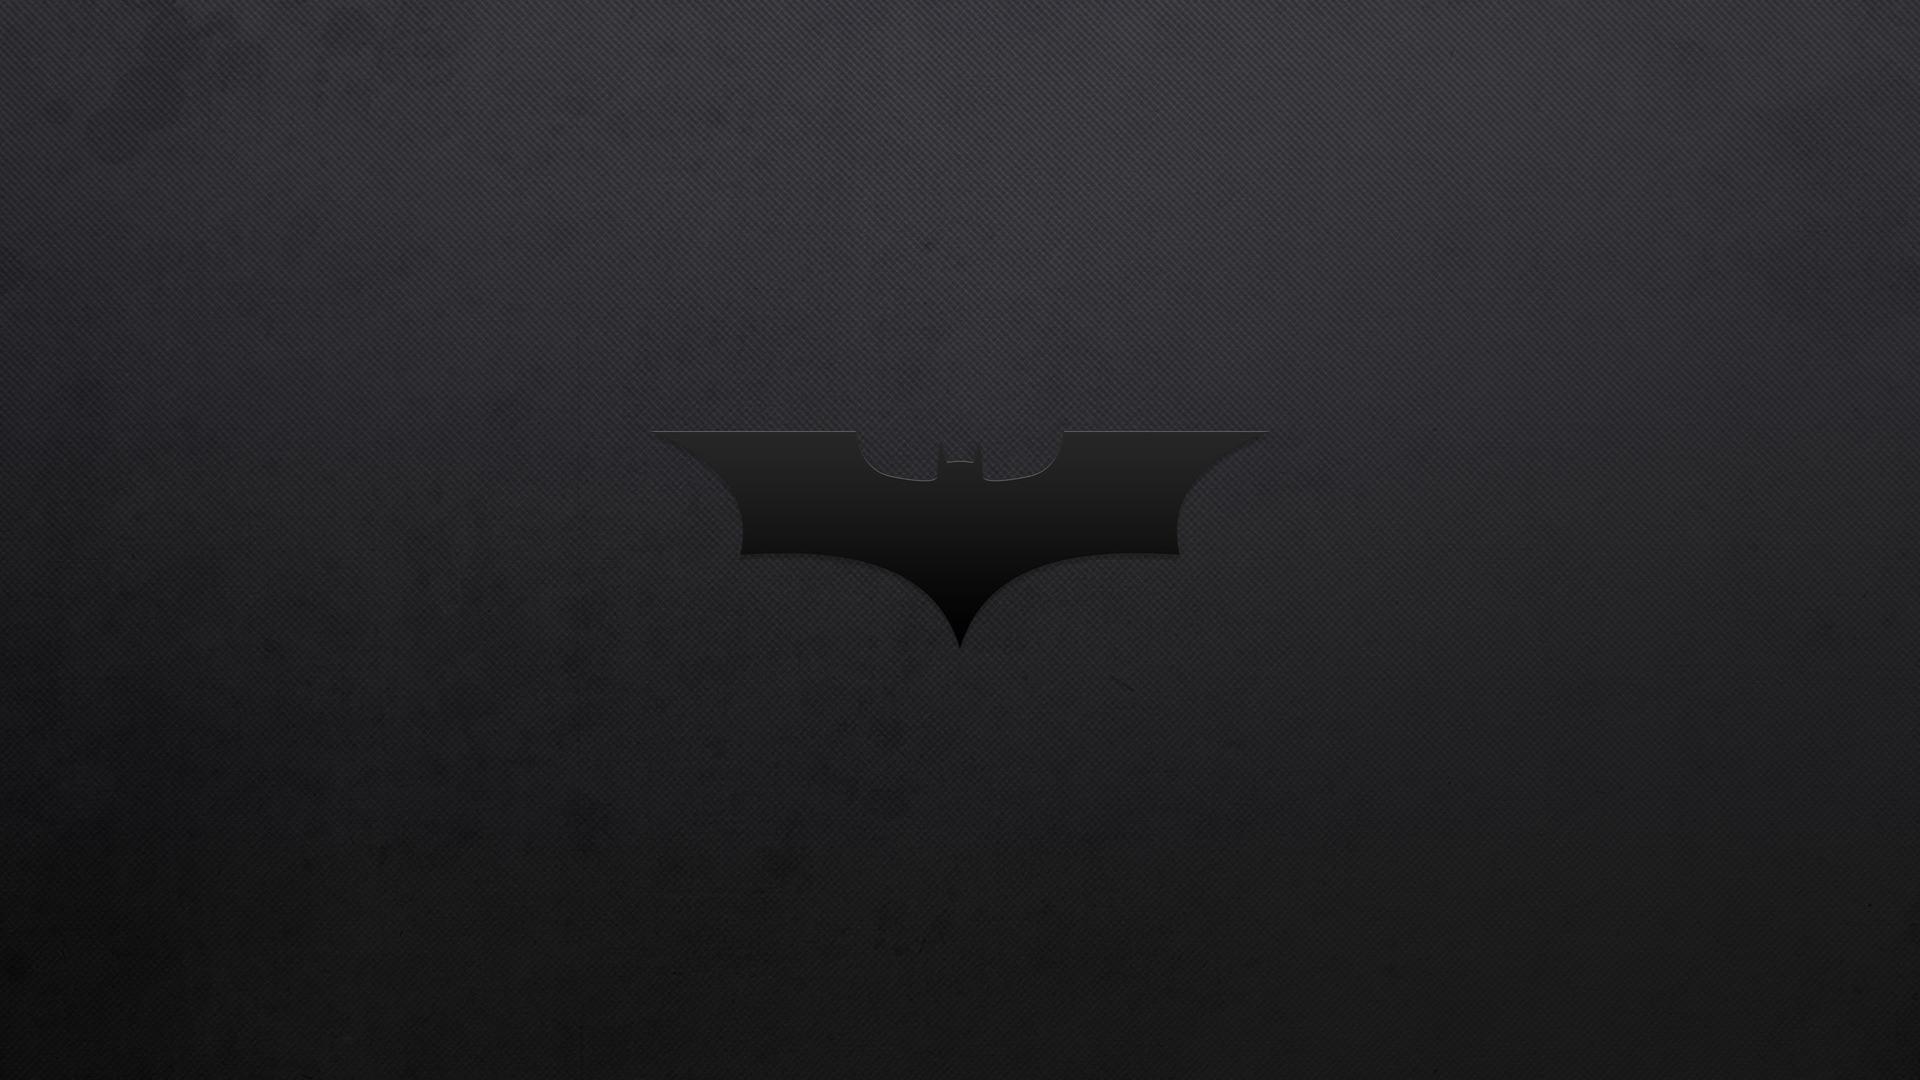 Batman Wallpaper Hd – WallpaperSafari